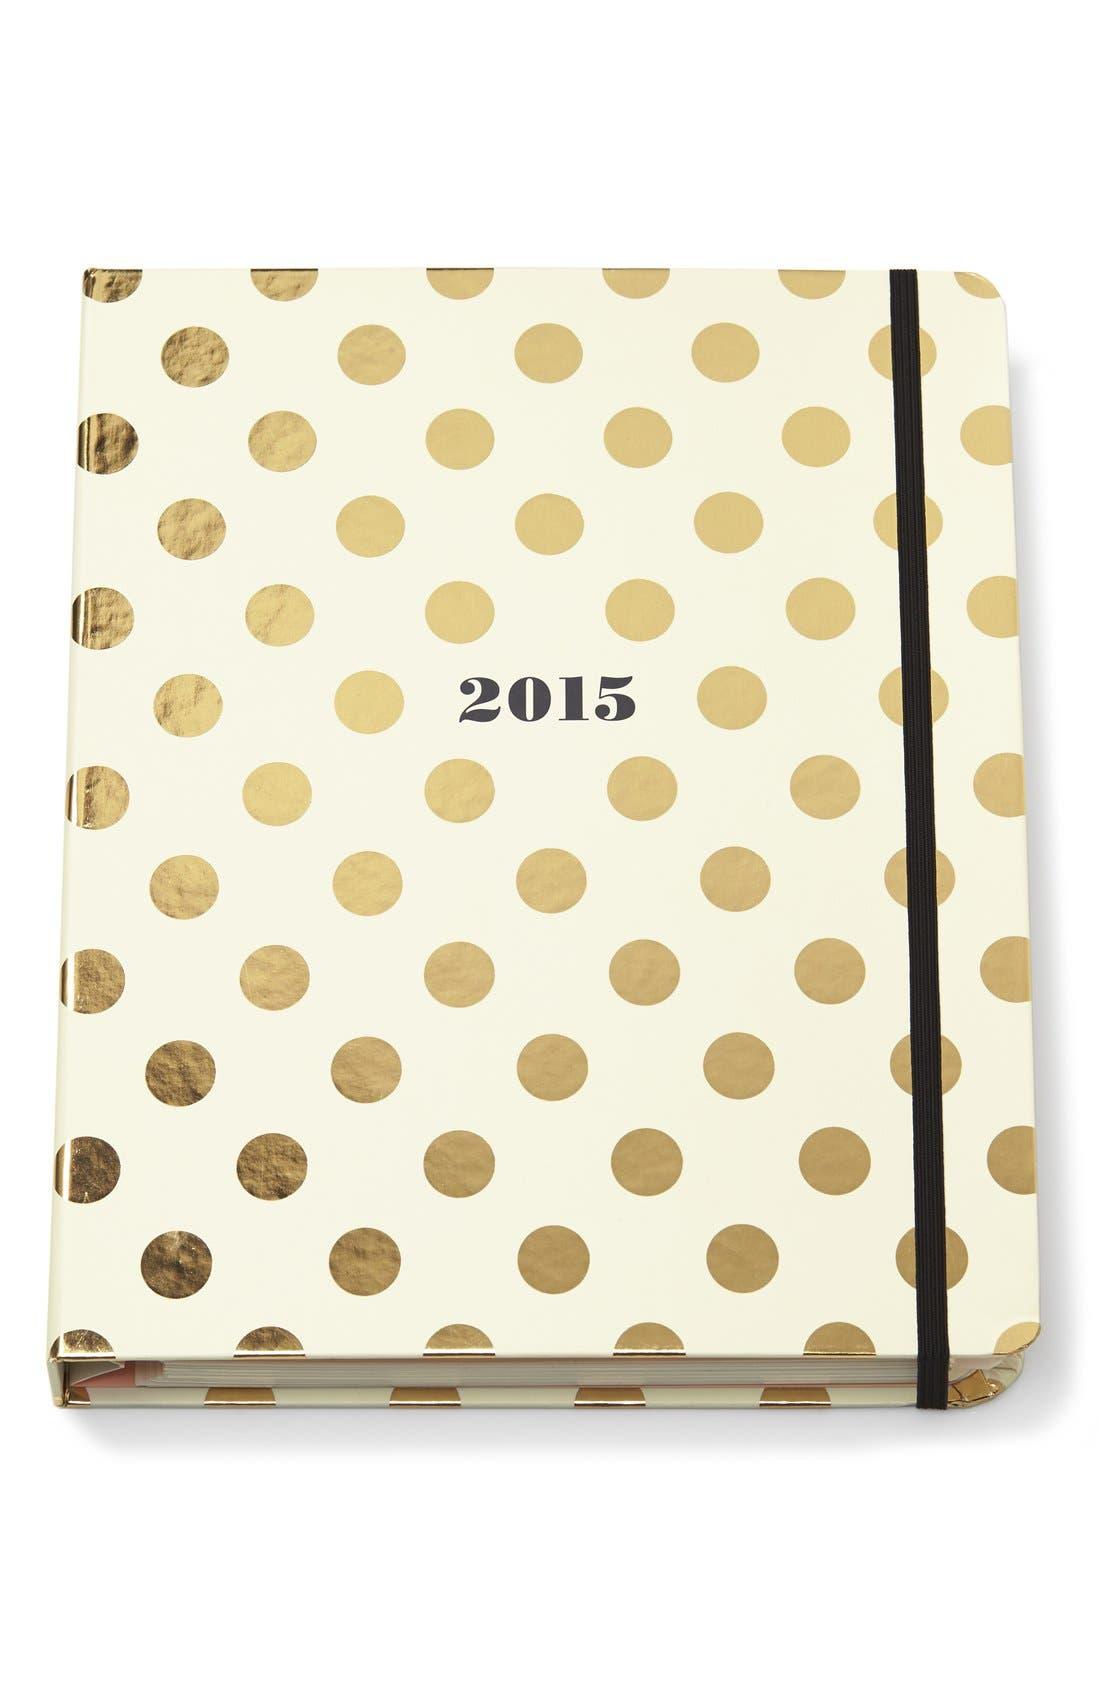 Alternate Image 1 Selected - kate spade new york 'large' journal